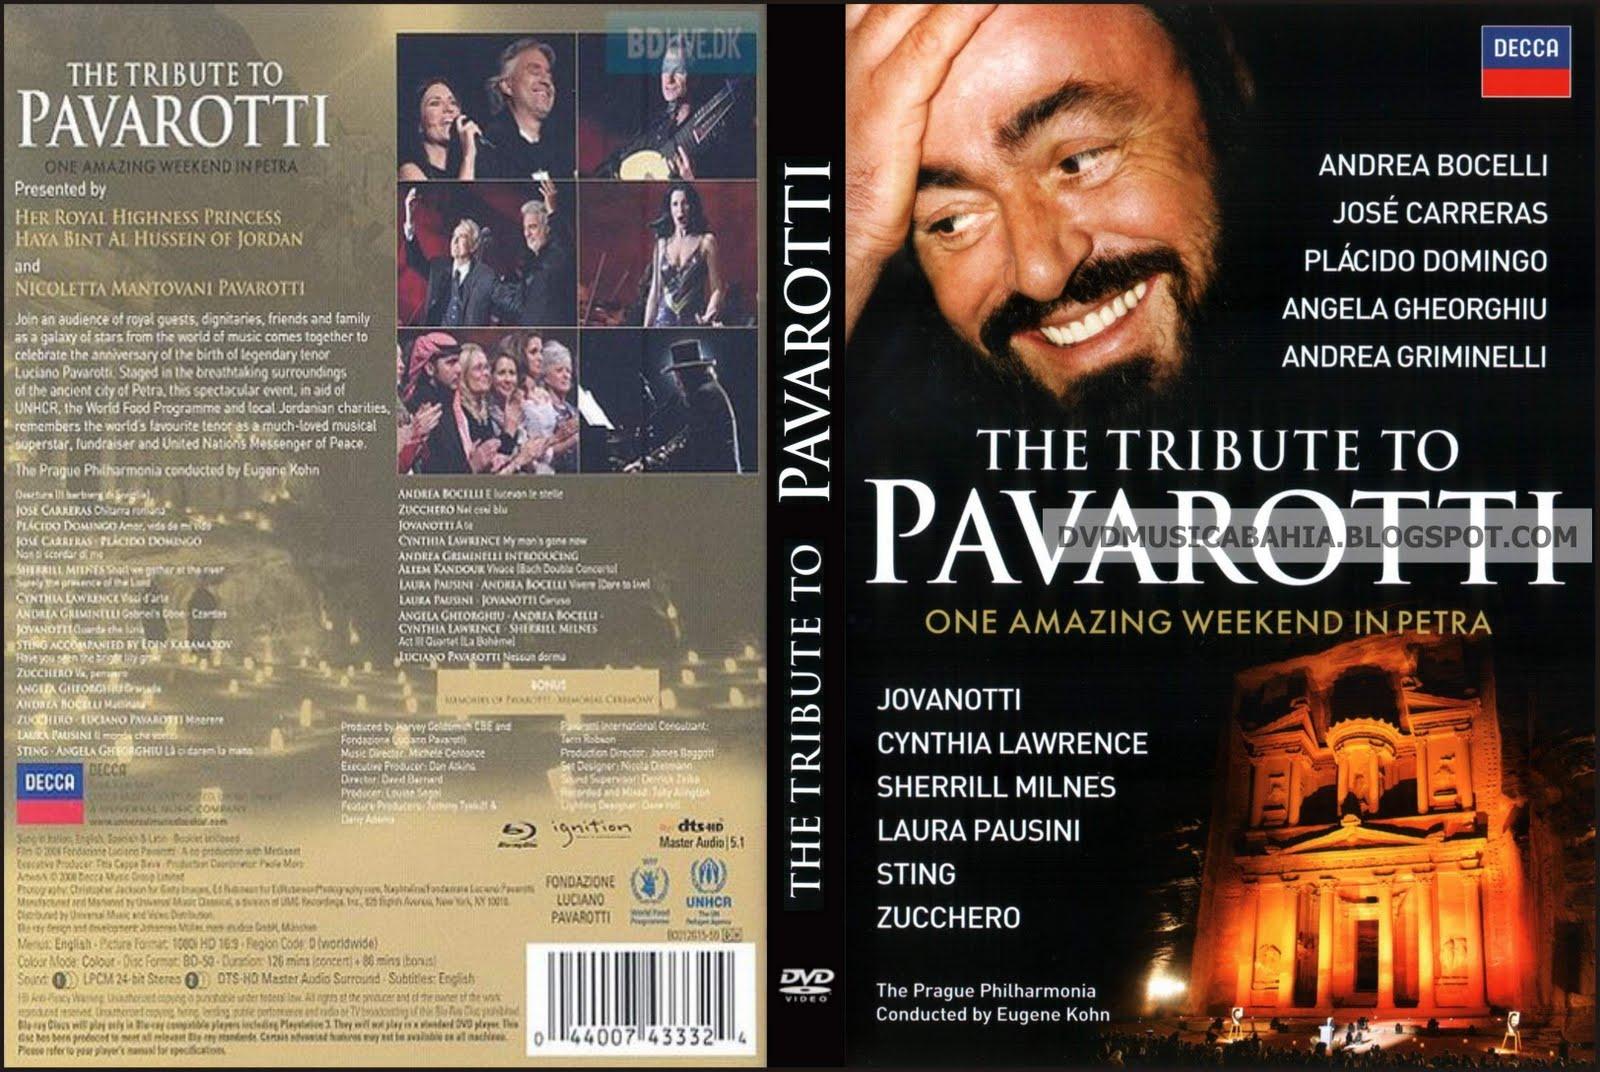 http://3.bp.blogspot.com/-9WoSTn5dg1Q/TkrxFDA2ouI/AAAAAAAABuI/iad_LKXMy1o/s1600/Tributo+a+Pavarotti+-+Un+Apasionante+fin+de+semana+en+Petra.jpg